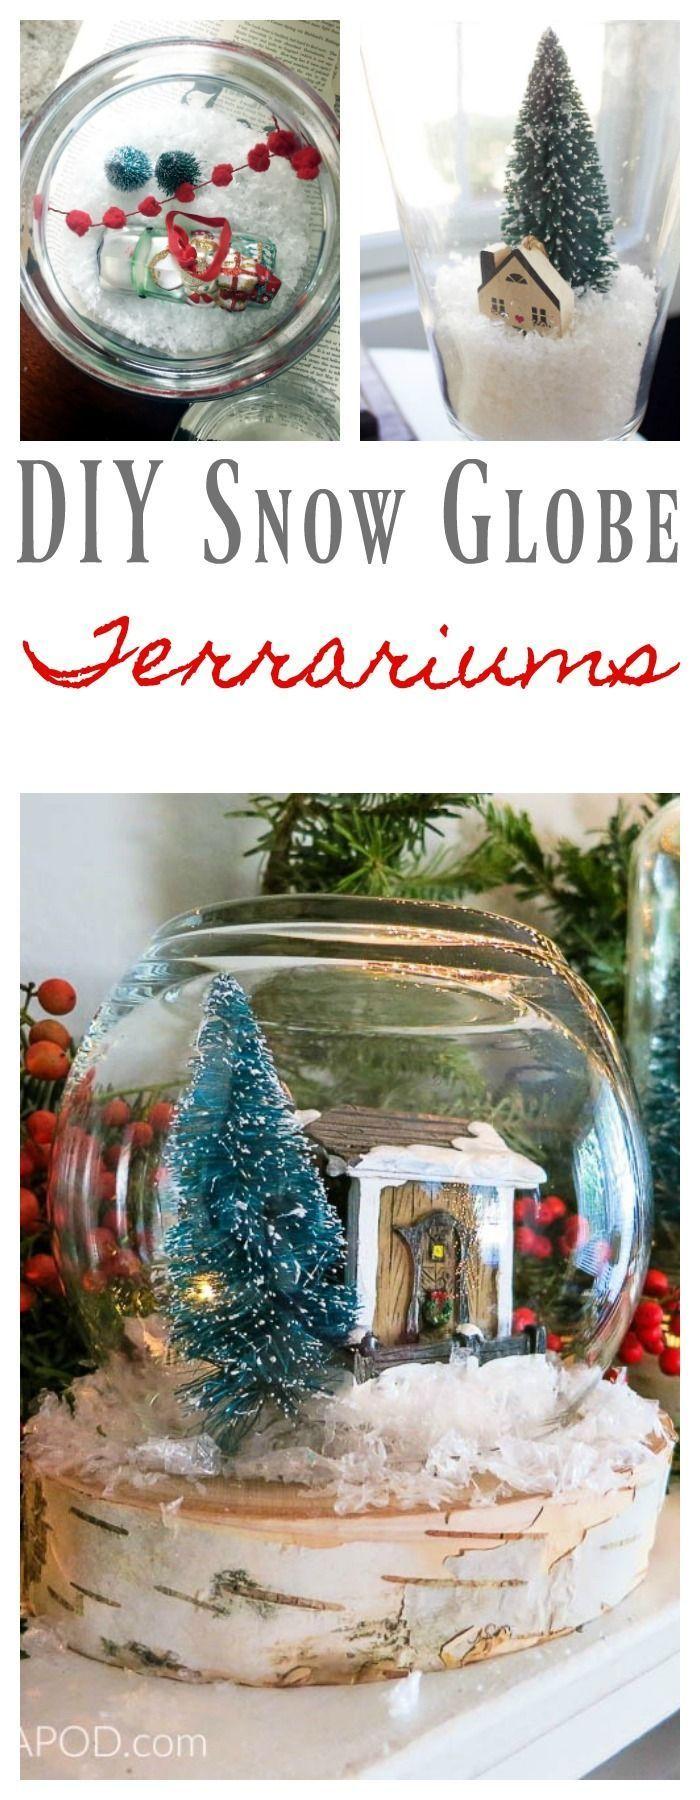 DIY Snow Globe Terrariums Diy snow globe, Snow globes